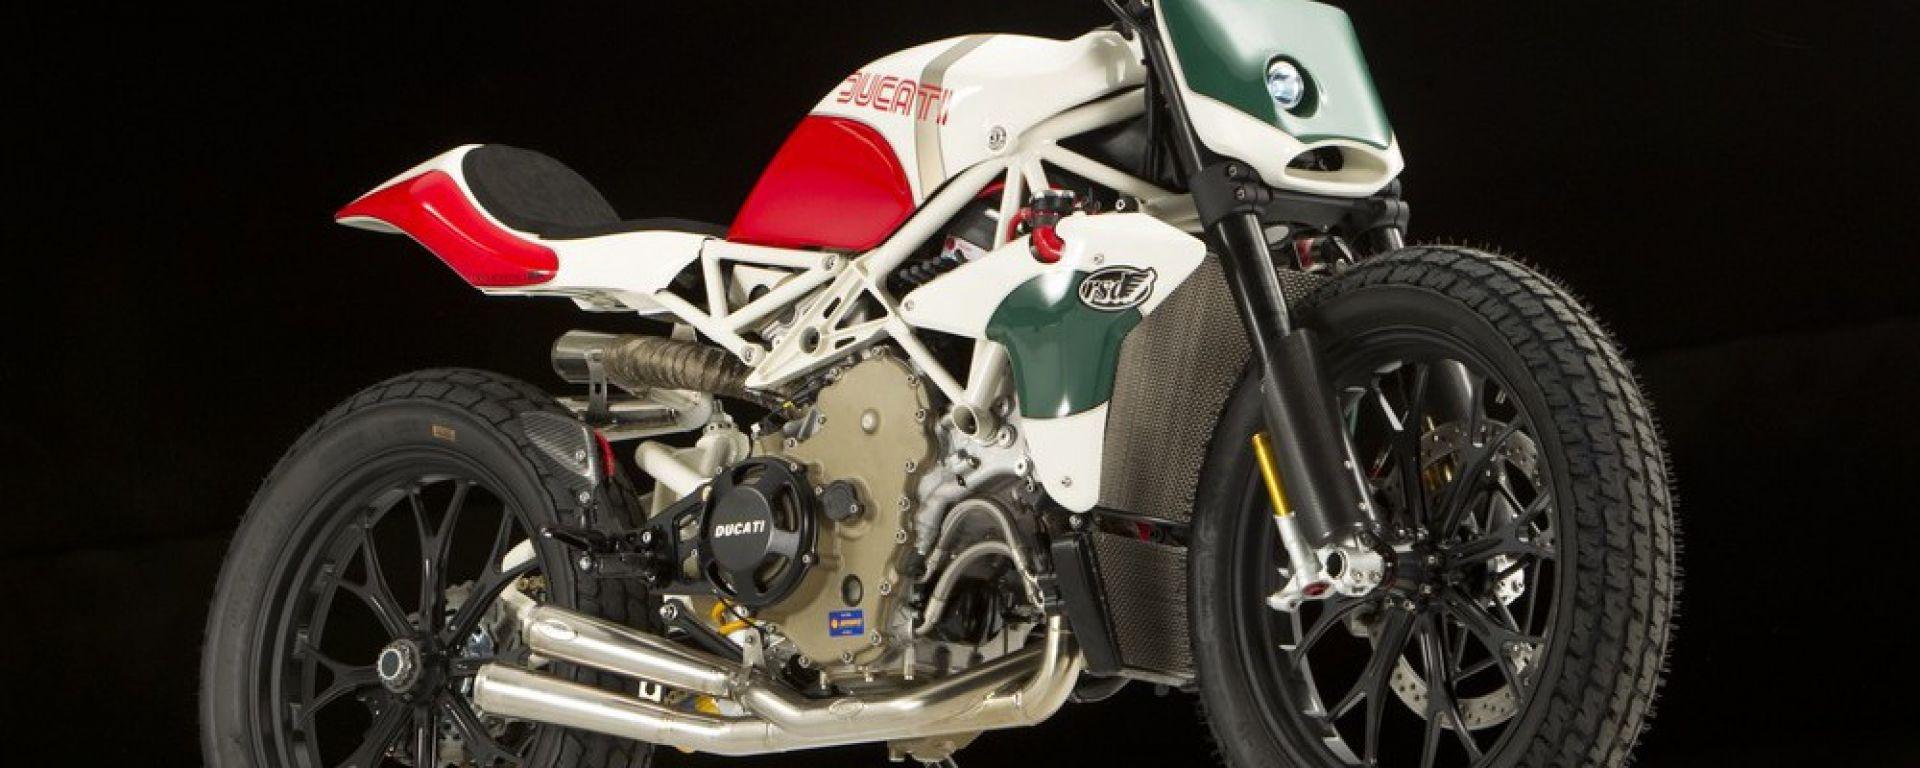 Ducati Desmosedici Dirt Track